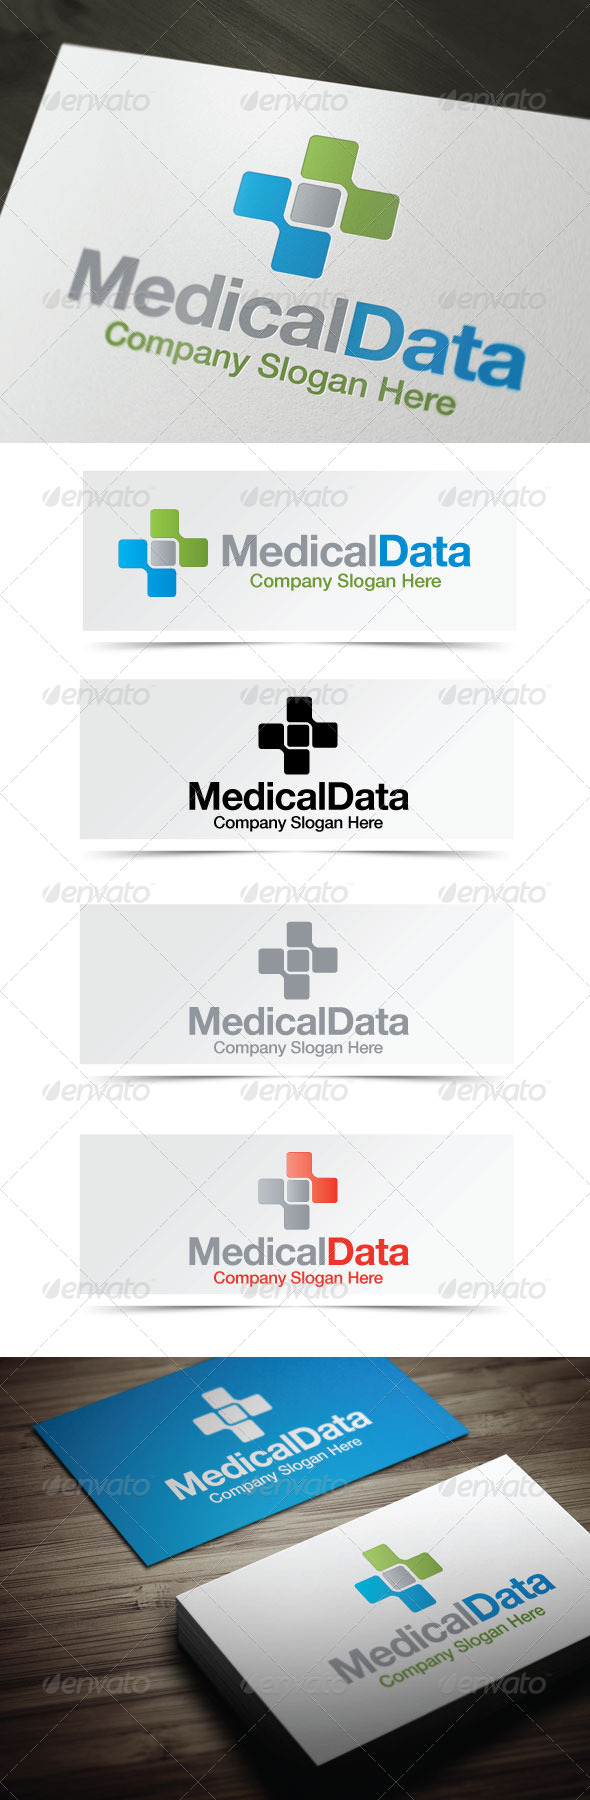 GraphicRiver Medical Data 4079752